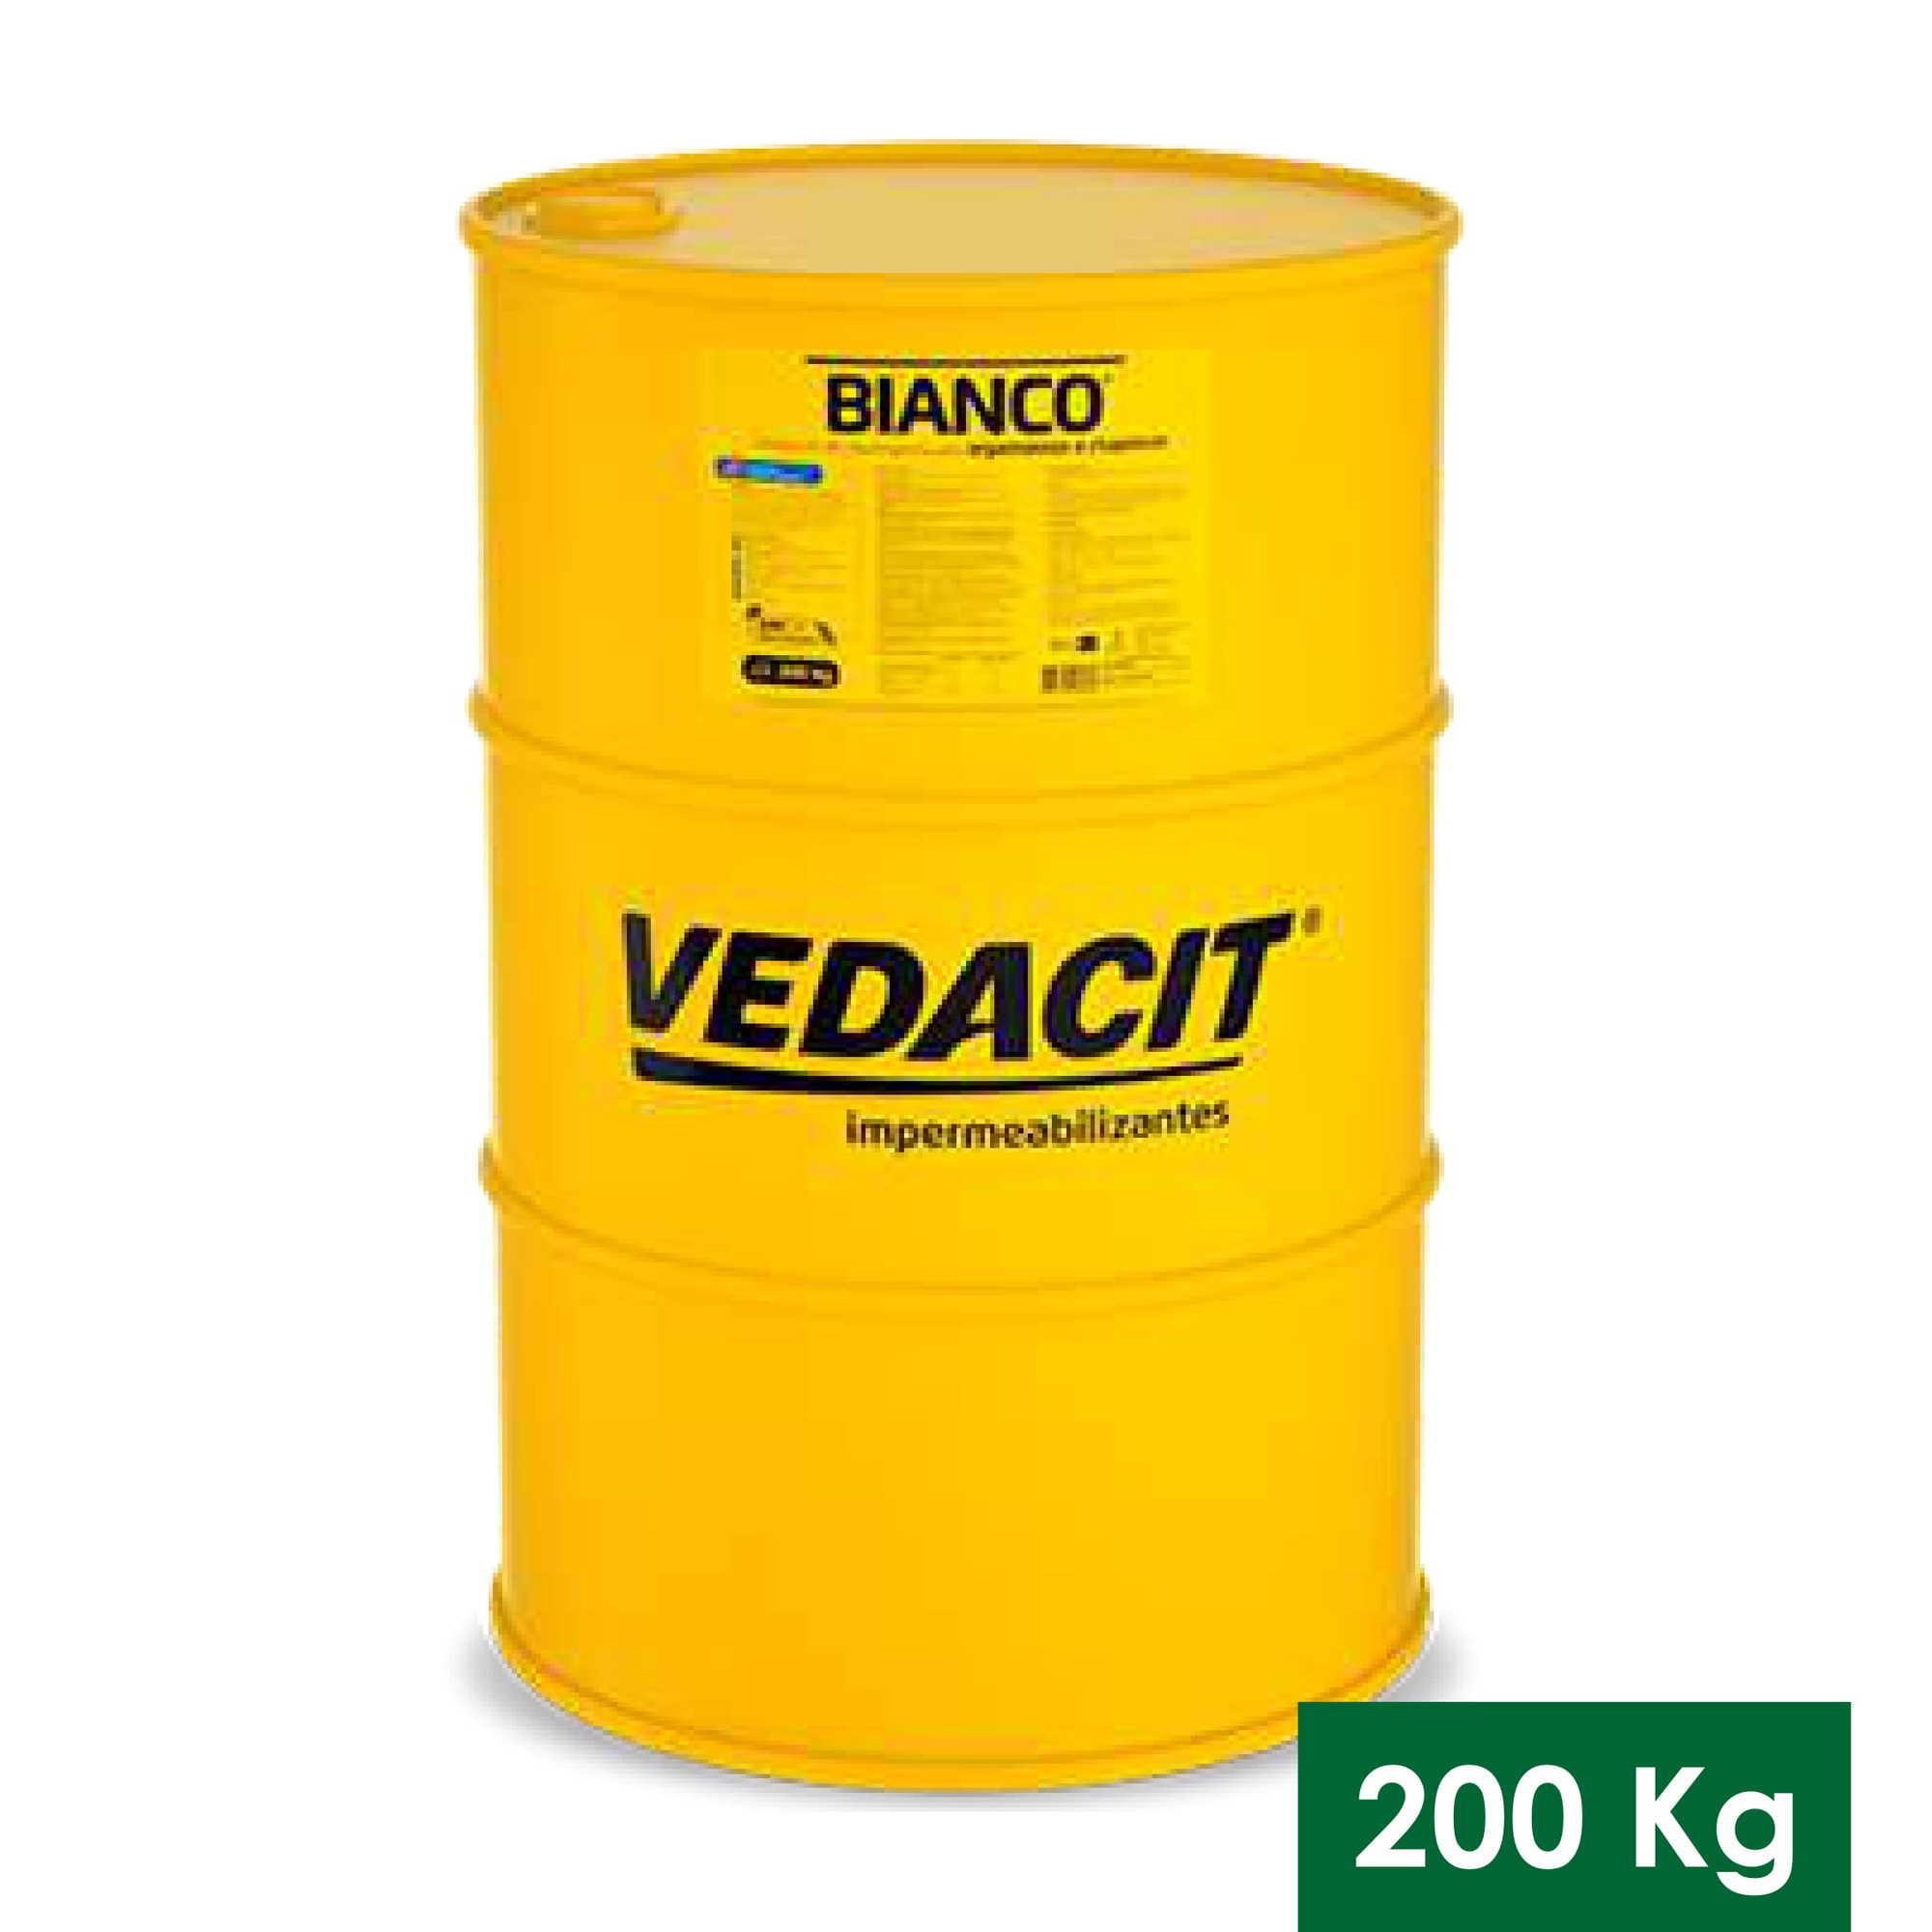 BIANCO TB 200 KG